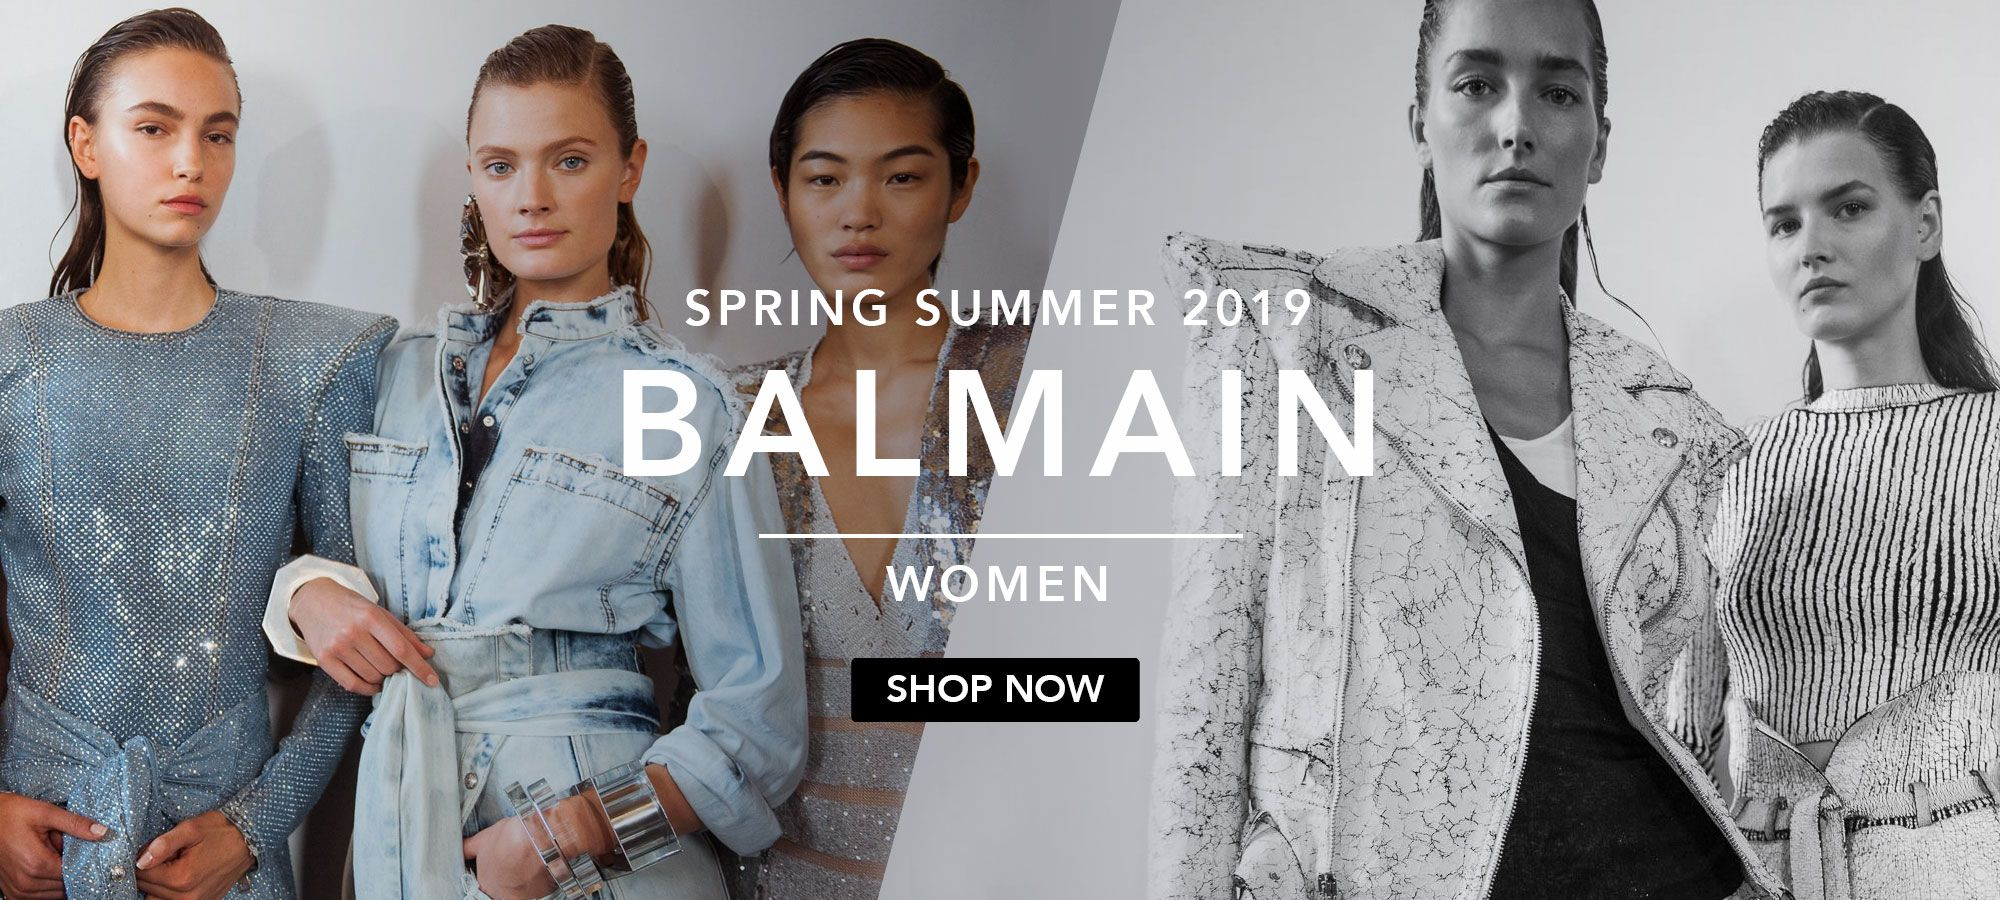 Balmain Women Spring Summer 2019 by italist